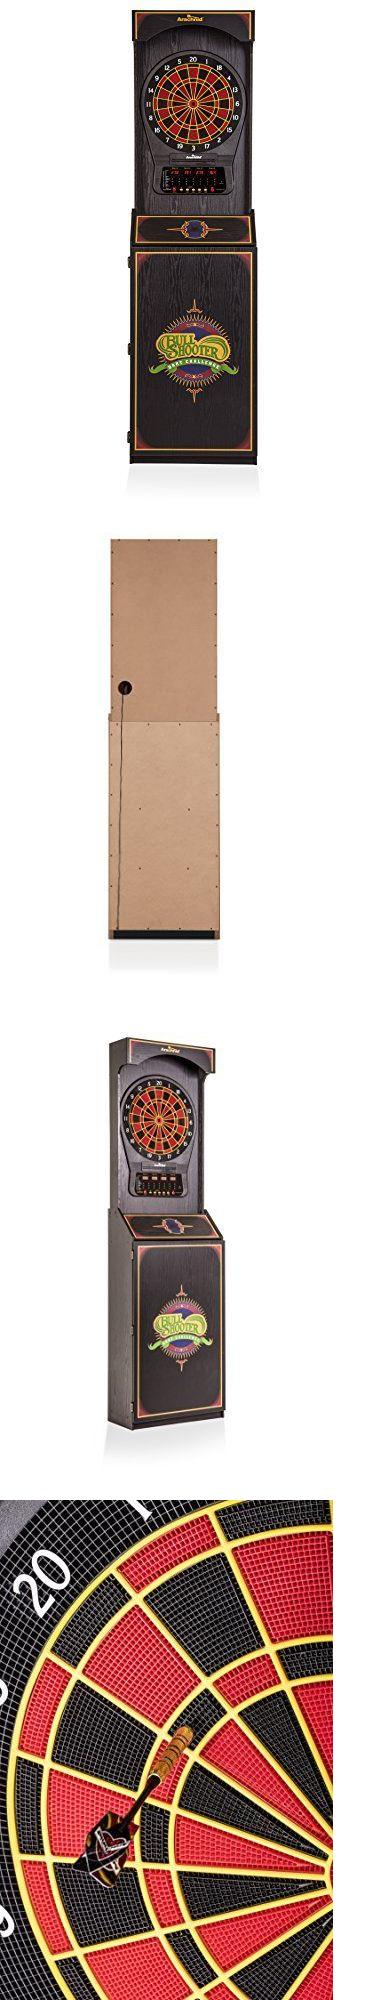 Rolling Pins 32885: Arachnid Arcade Style Cabinet Dart Game ...